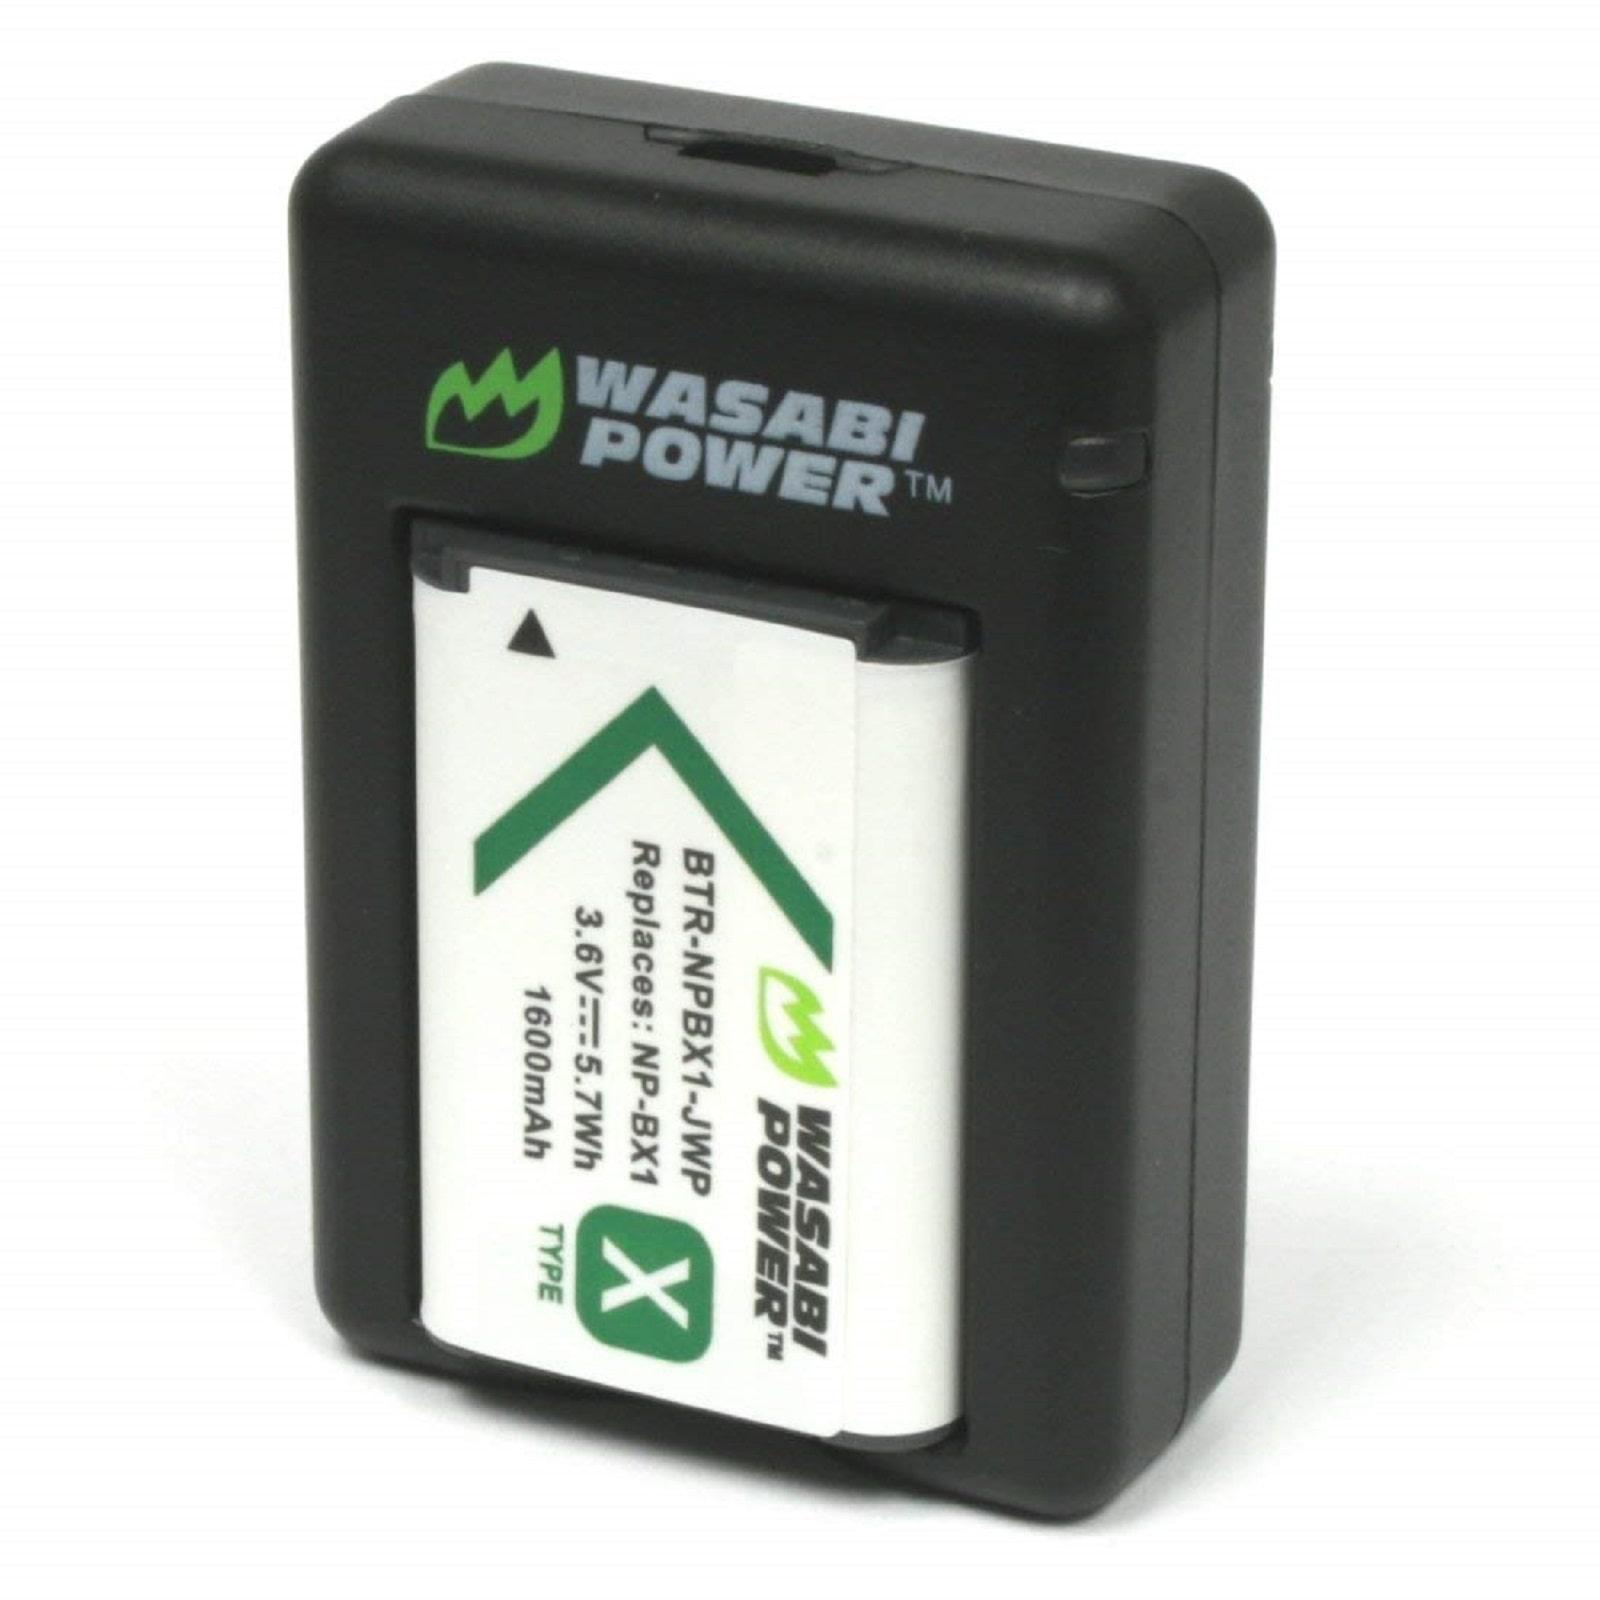 2x NP-BX1//M8 Batería Para Cámara FDR-X1000V//W FDR-X3000 X3000R SONY Action Cargador